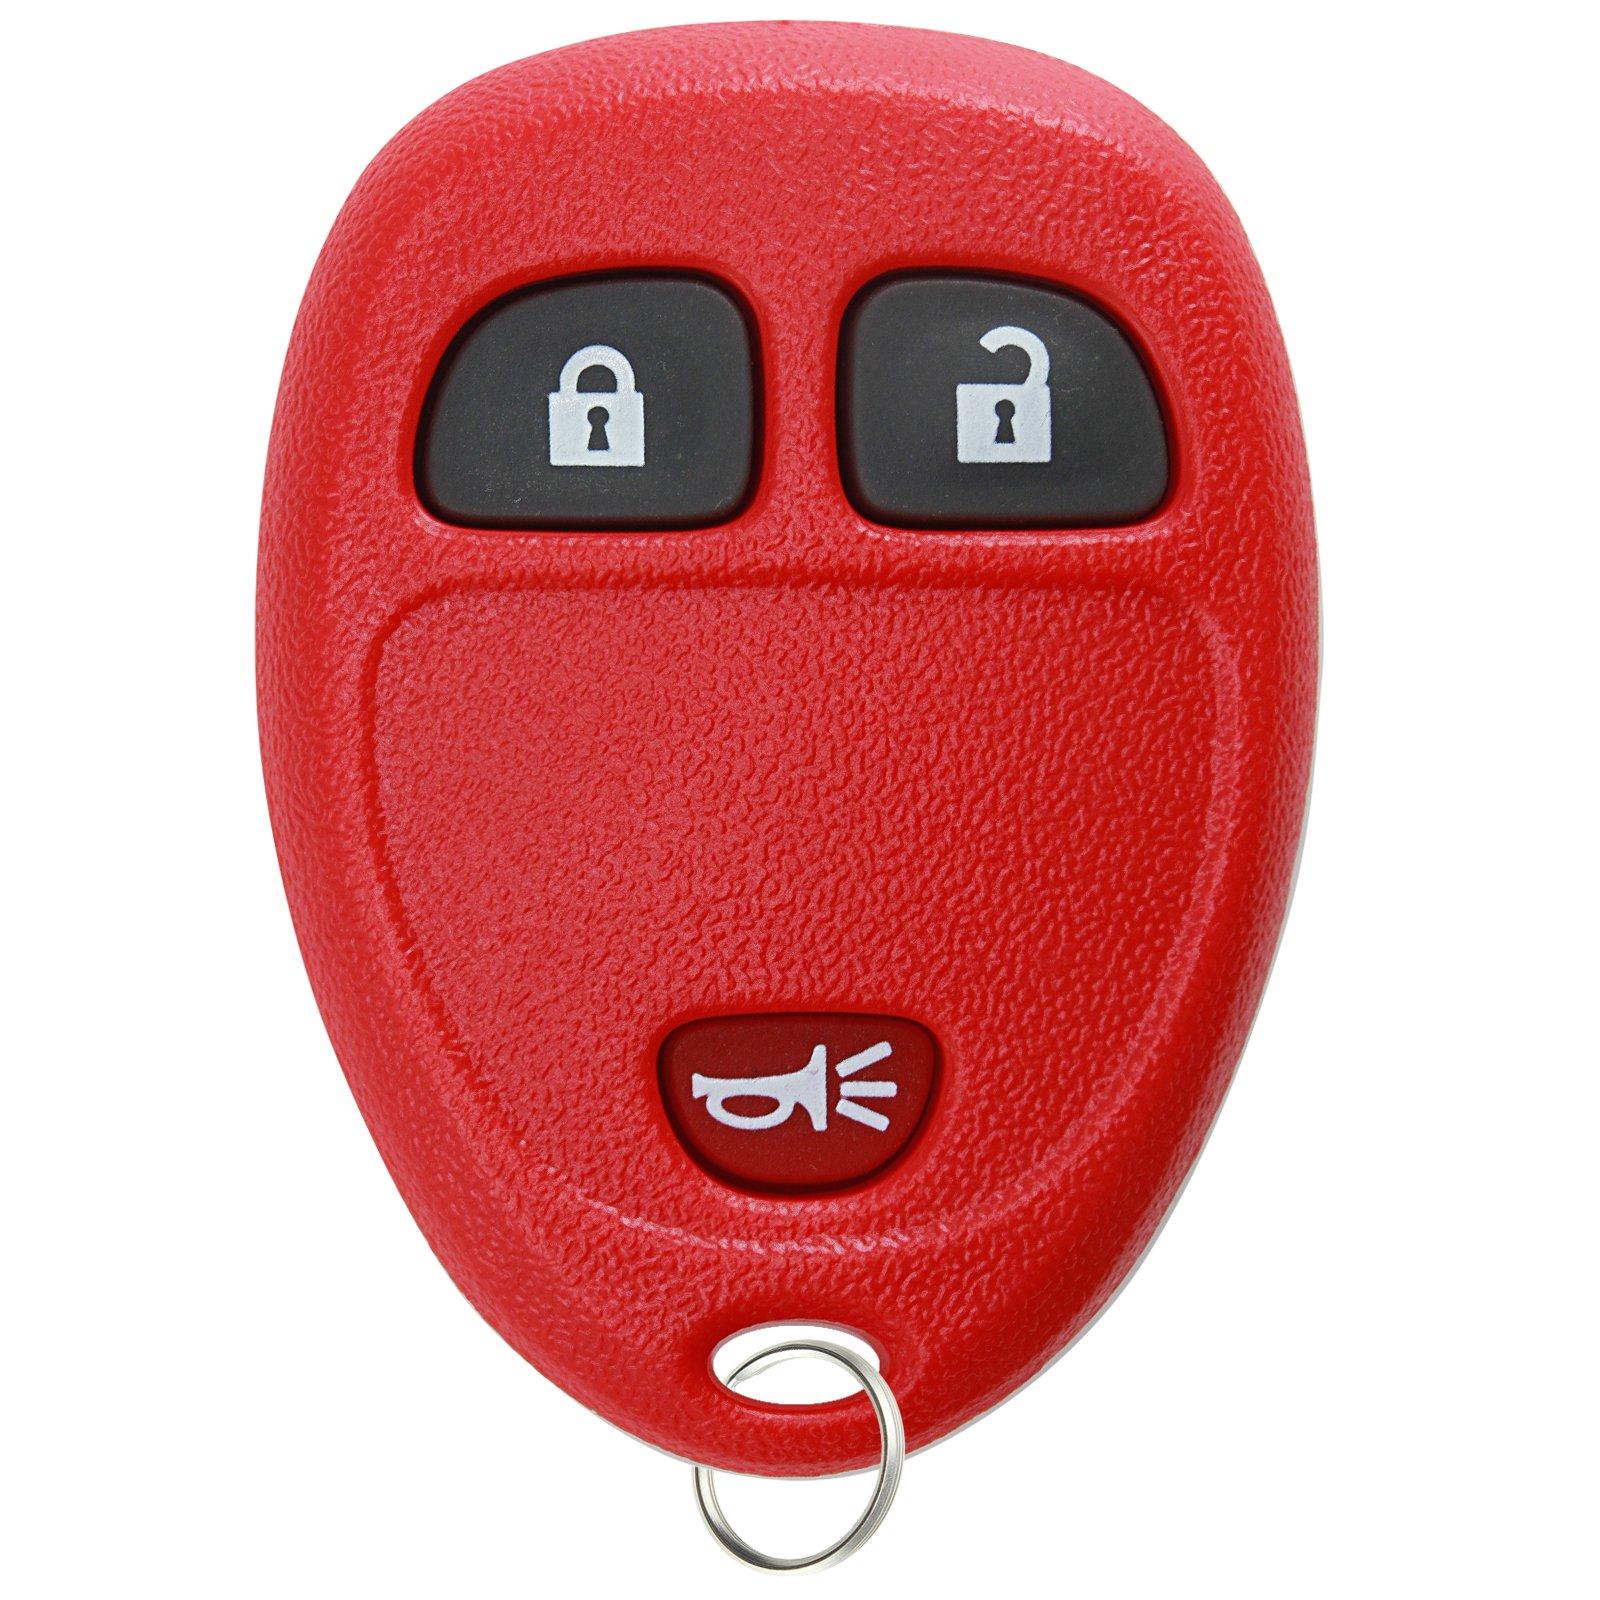 KeylessOption Keyless Entry Remote Control Car Key Fob Replacement for 15913420 Red by KeylessOption